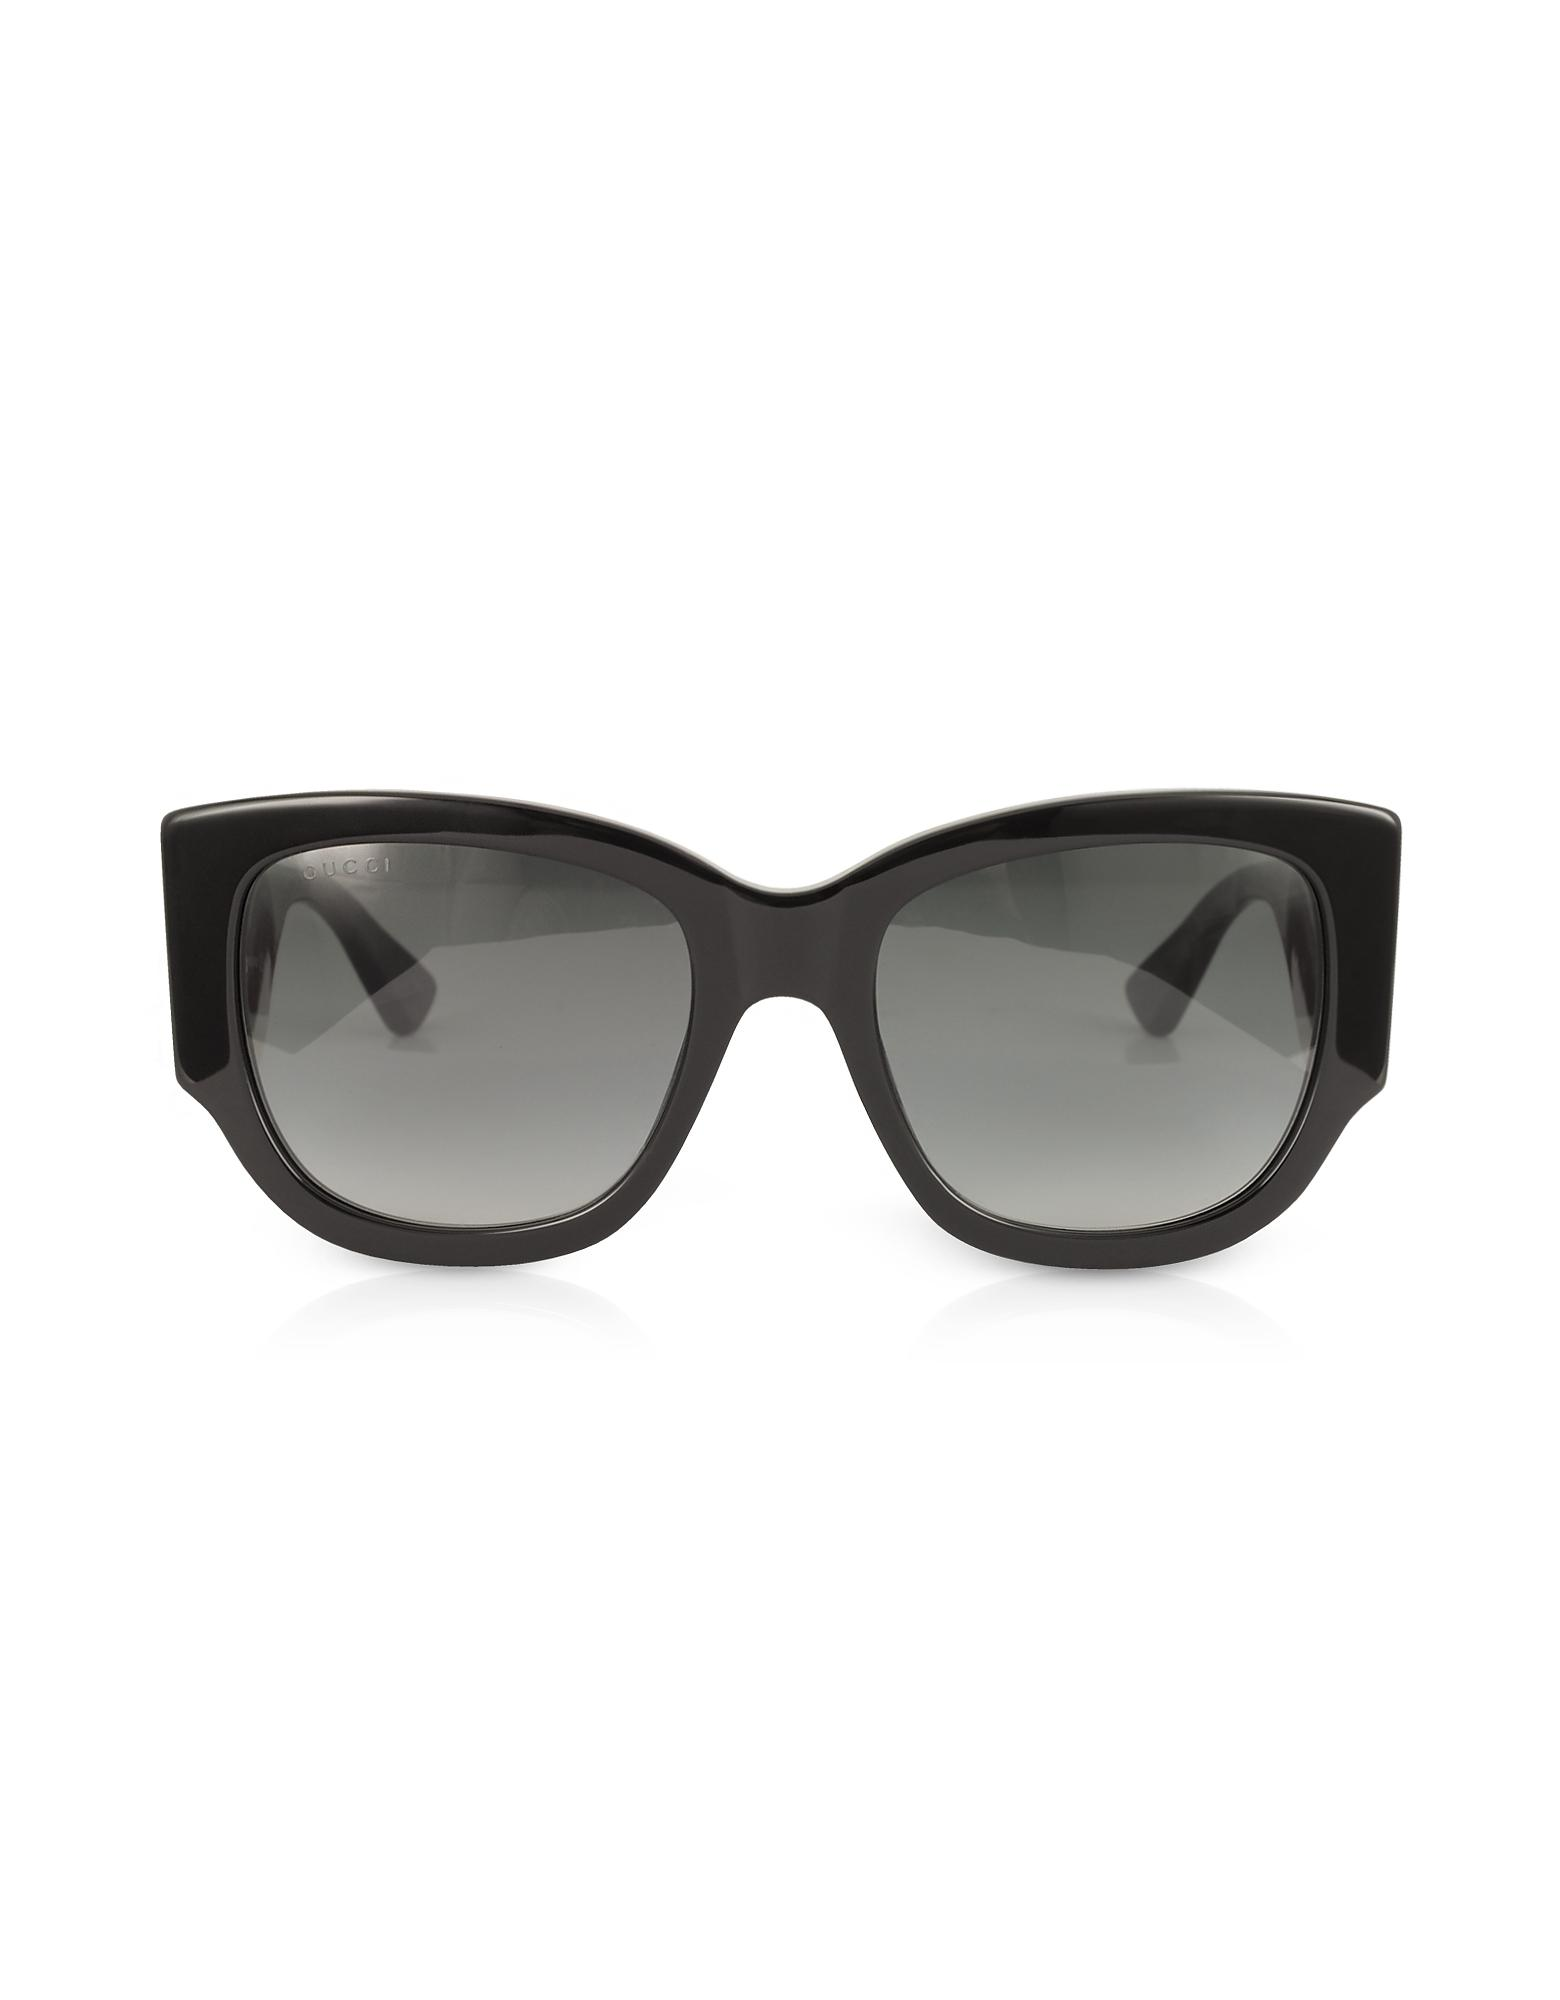 7efe92477b8 ... Black Oversize Cat Eye Acetate Sunglasses W sylvie Web Temples - Lyst.  View fullscreen